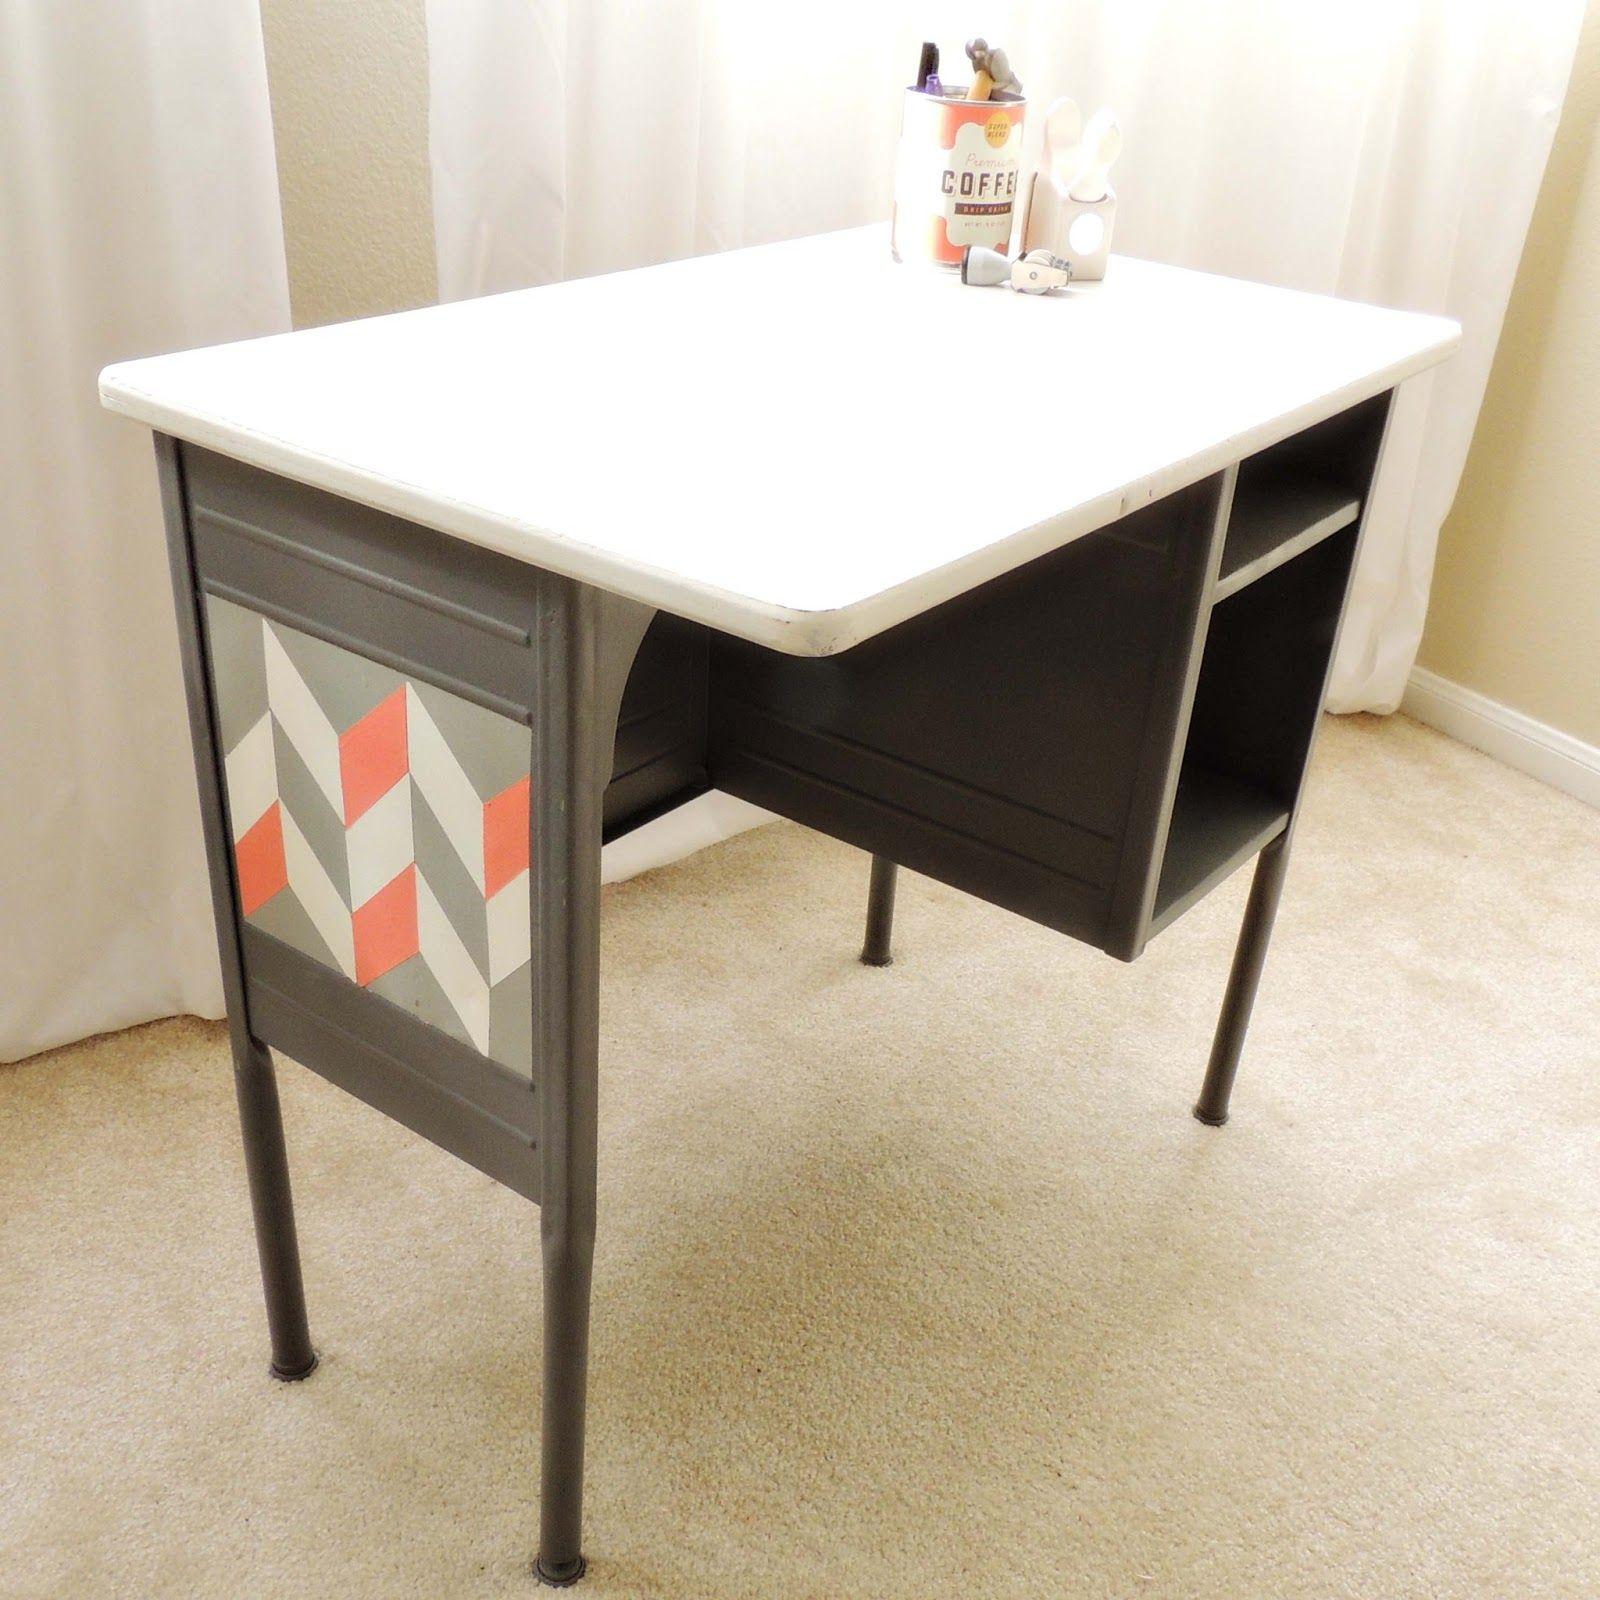 Vintage Metal School Desk Before & After Josie just like your metal desks  and she painted